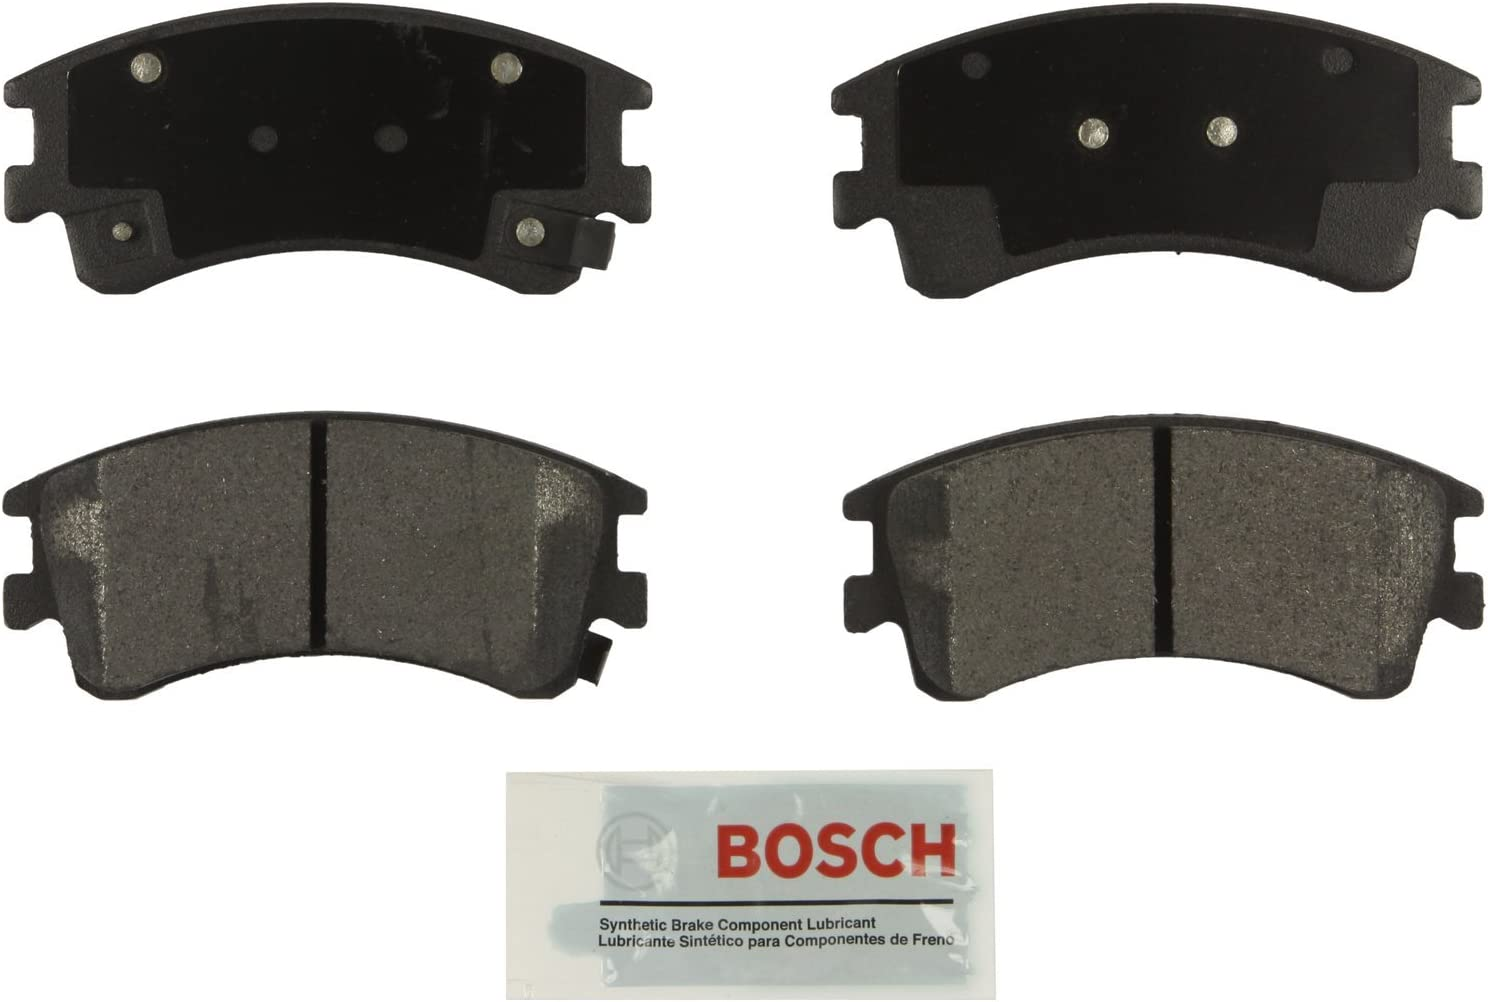 Bosch BE1326 Blue Disc Brake Pad Set